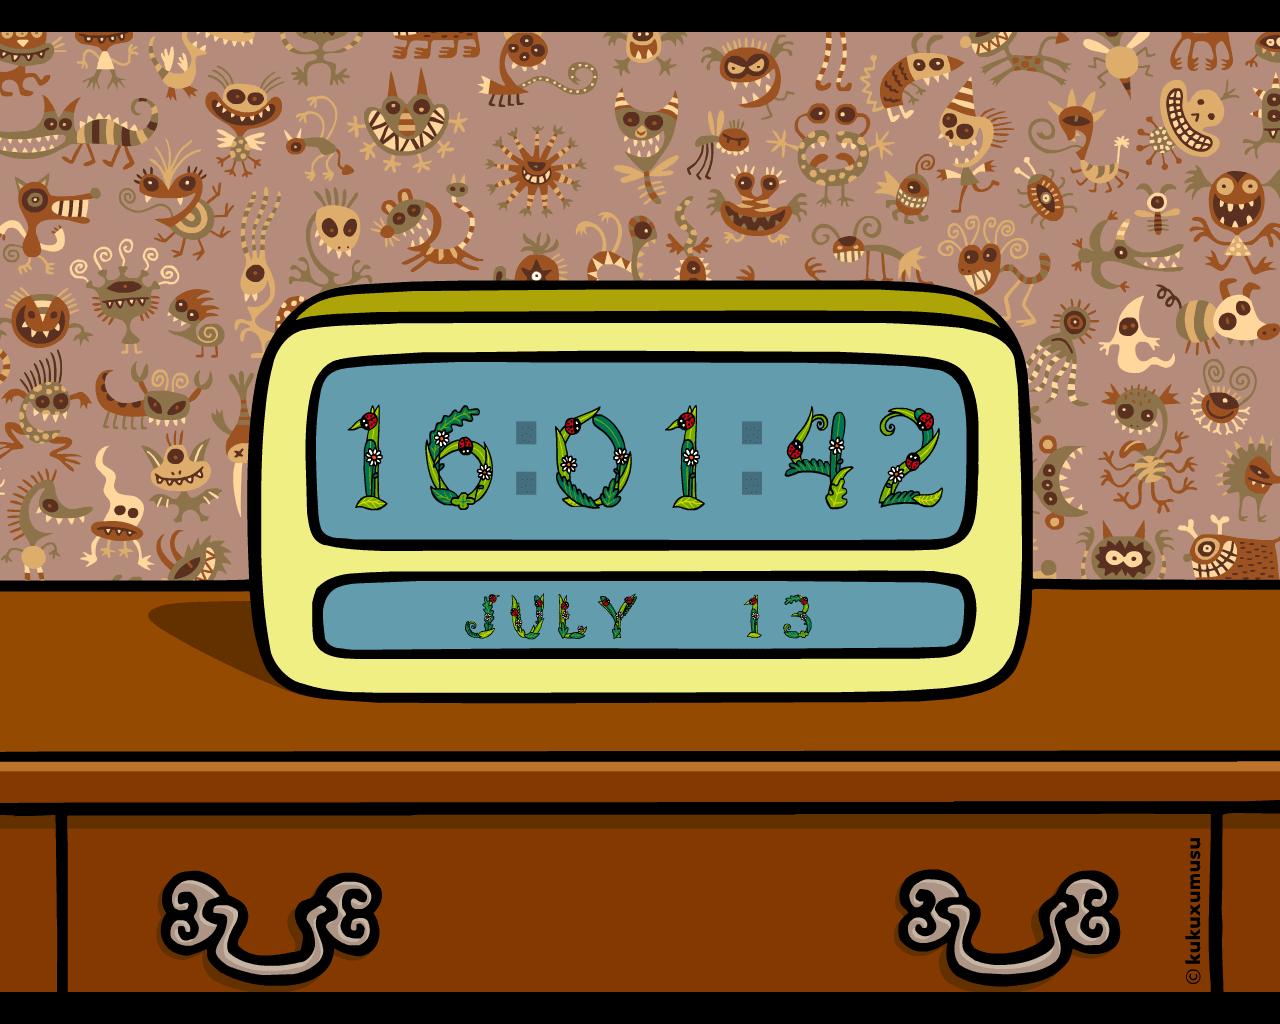 Kukuxumusu Digital Clock